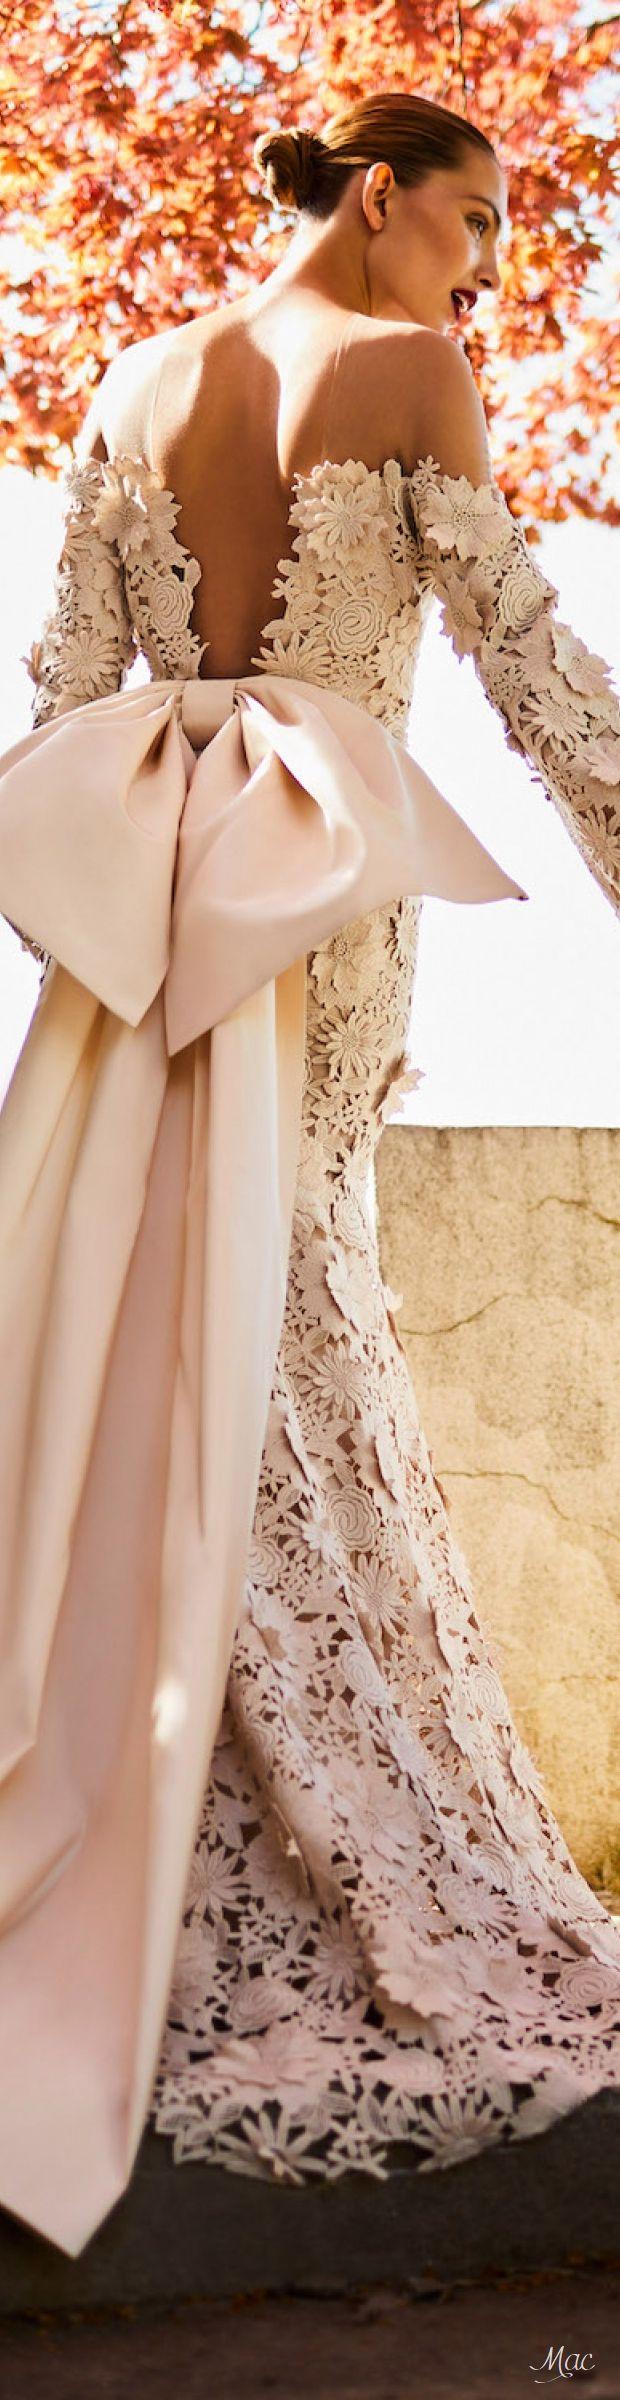 best bridal u weddings images on pinterest wedding ideas a